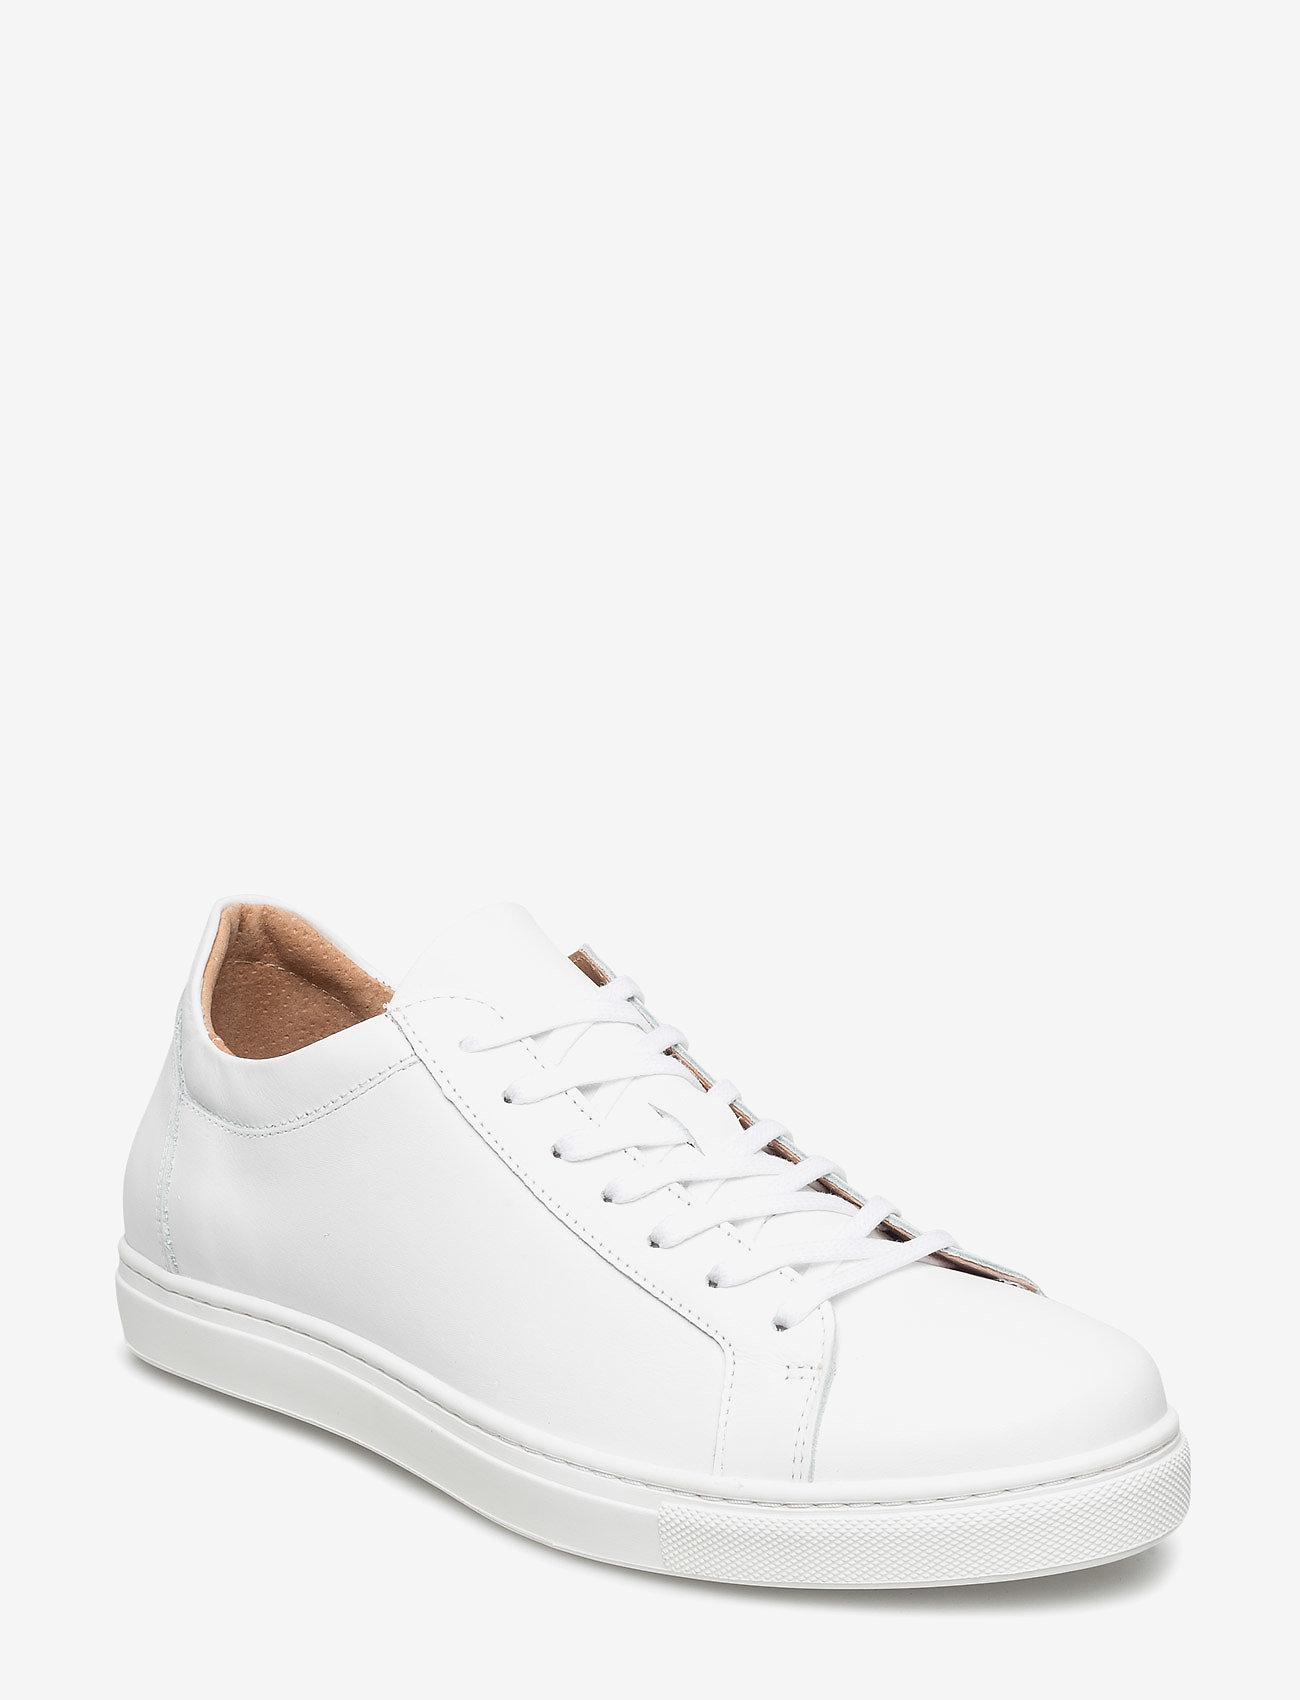 Selected Homme - SLHDAVID SNEAKER W NOOS - laag sneakers - white - 0